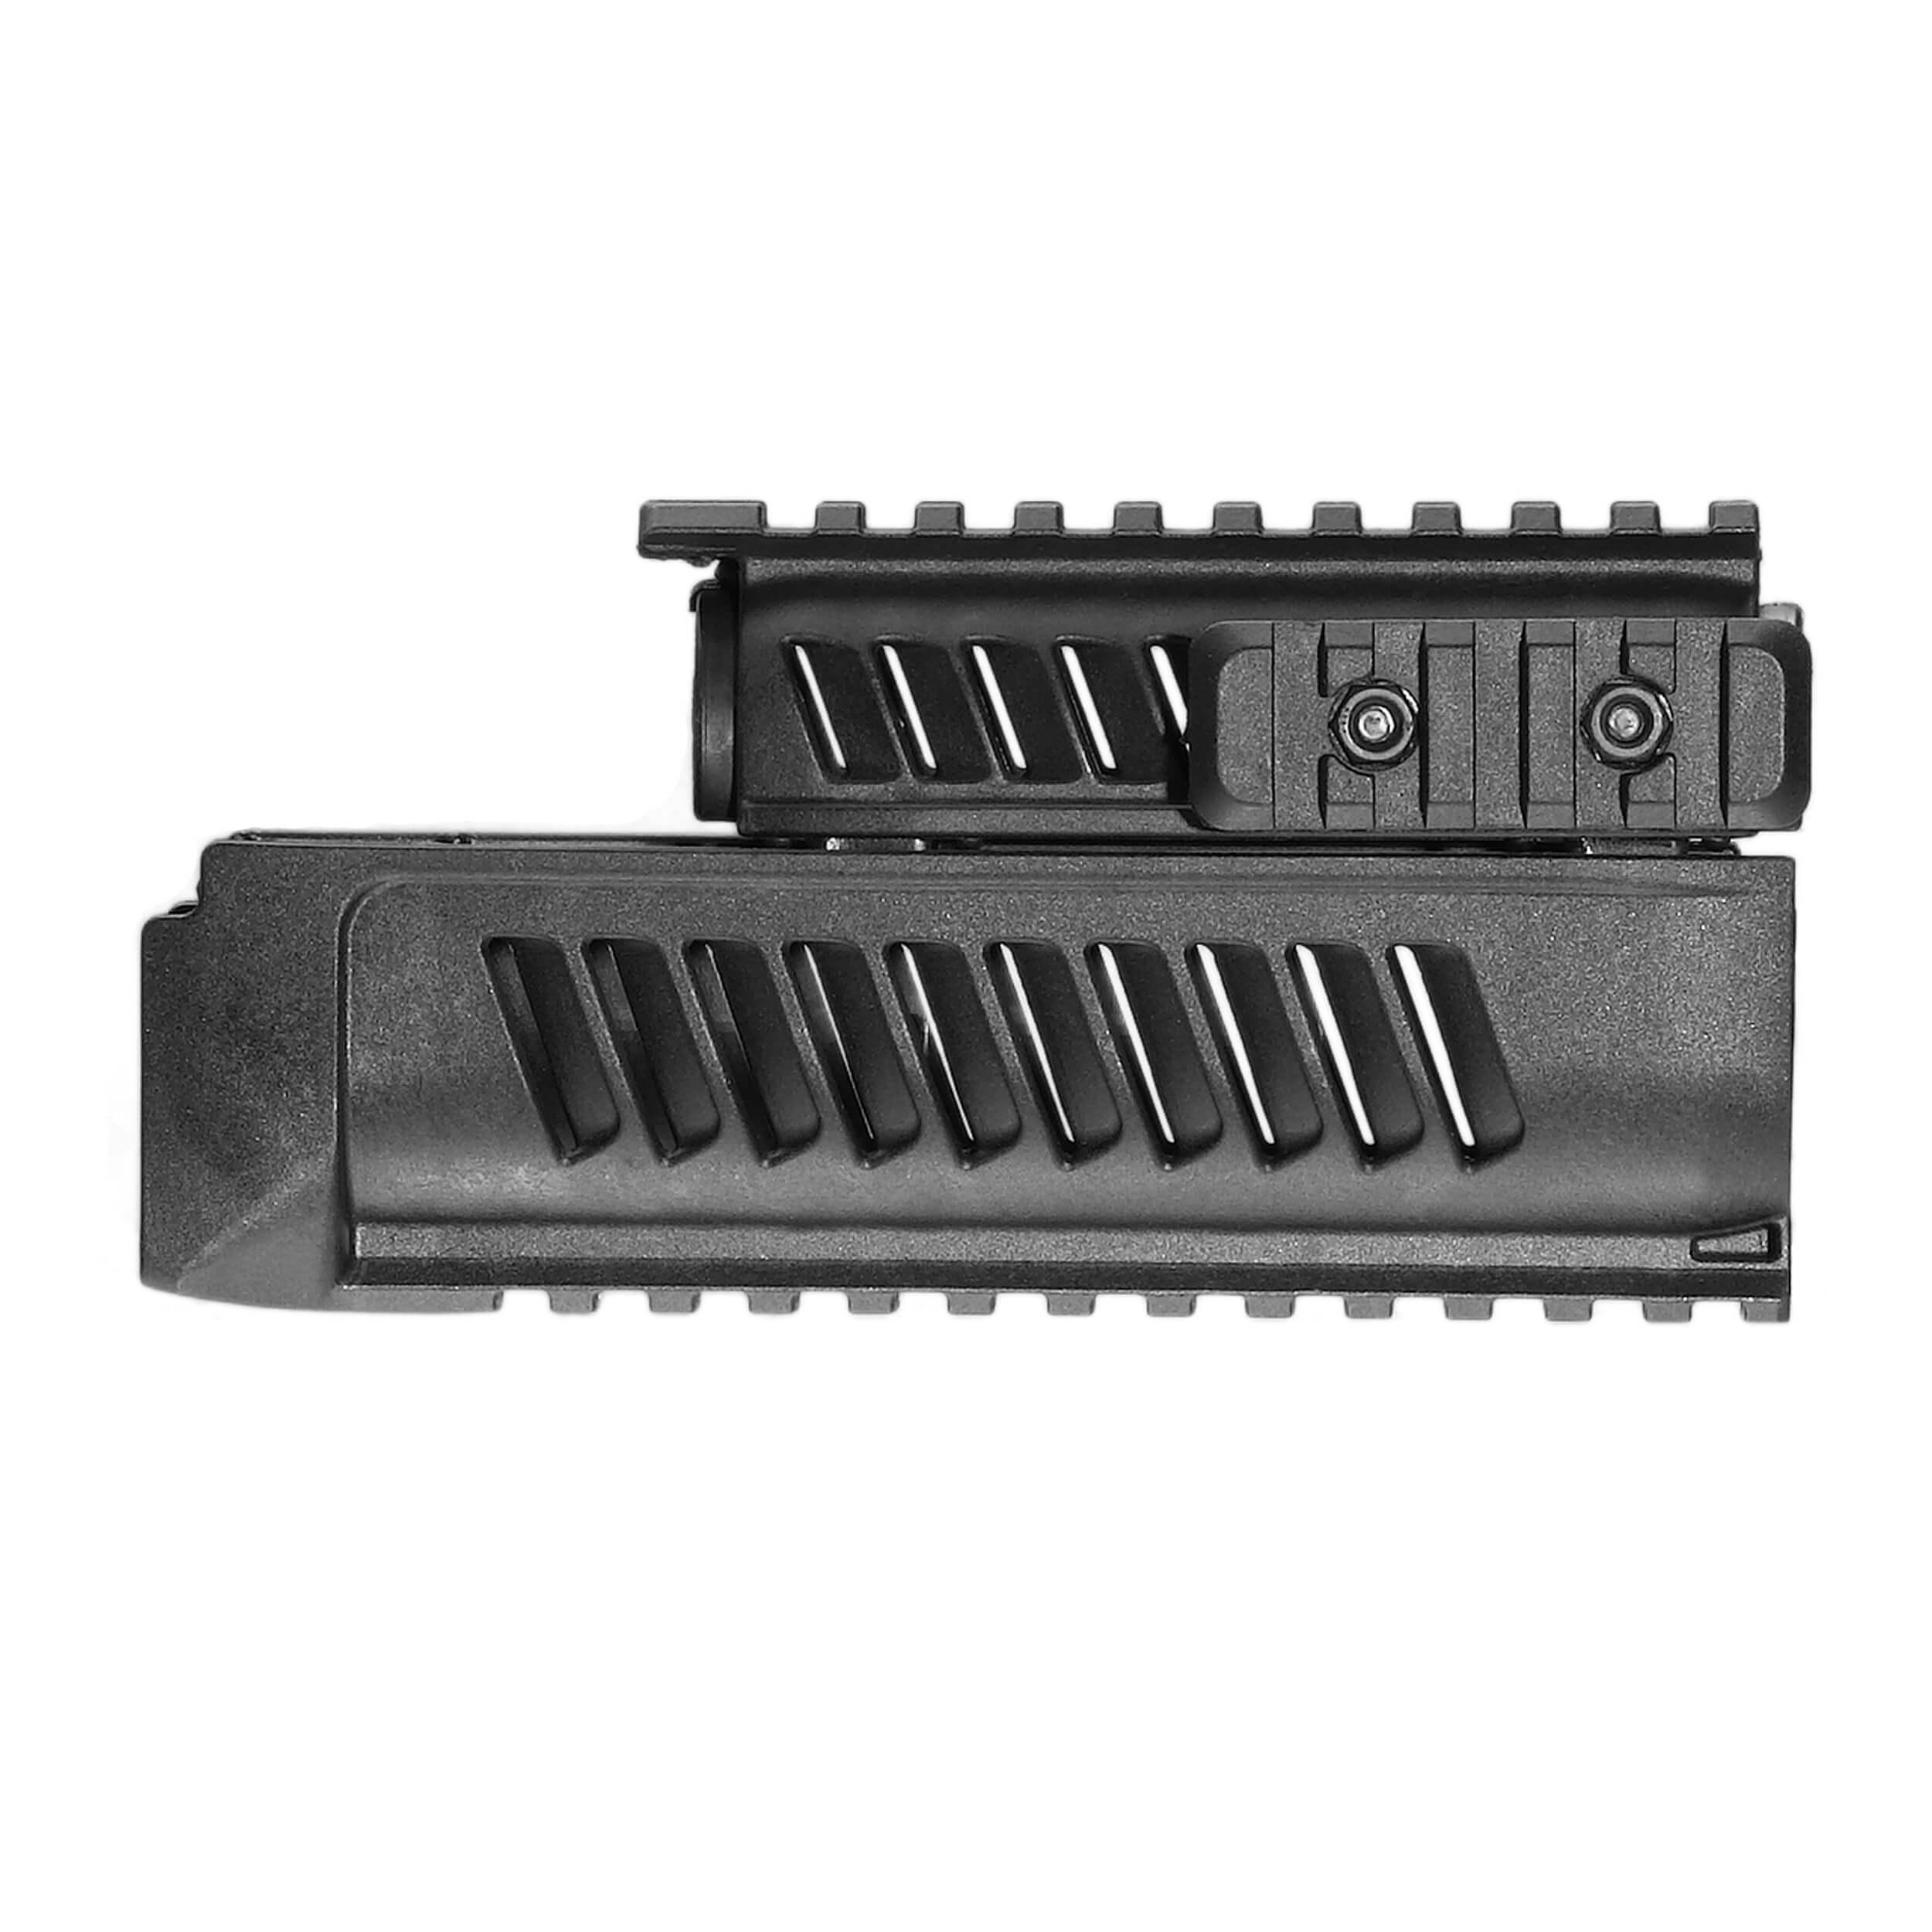 AK-47 / 74 Quad Rail Polymer Handguard